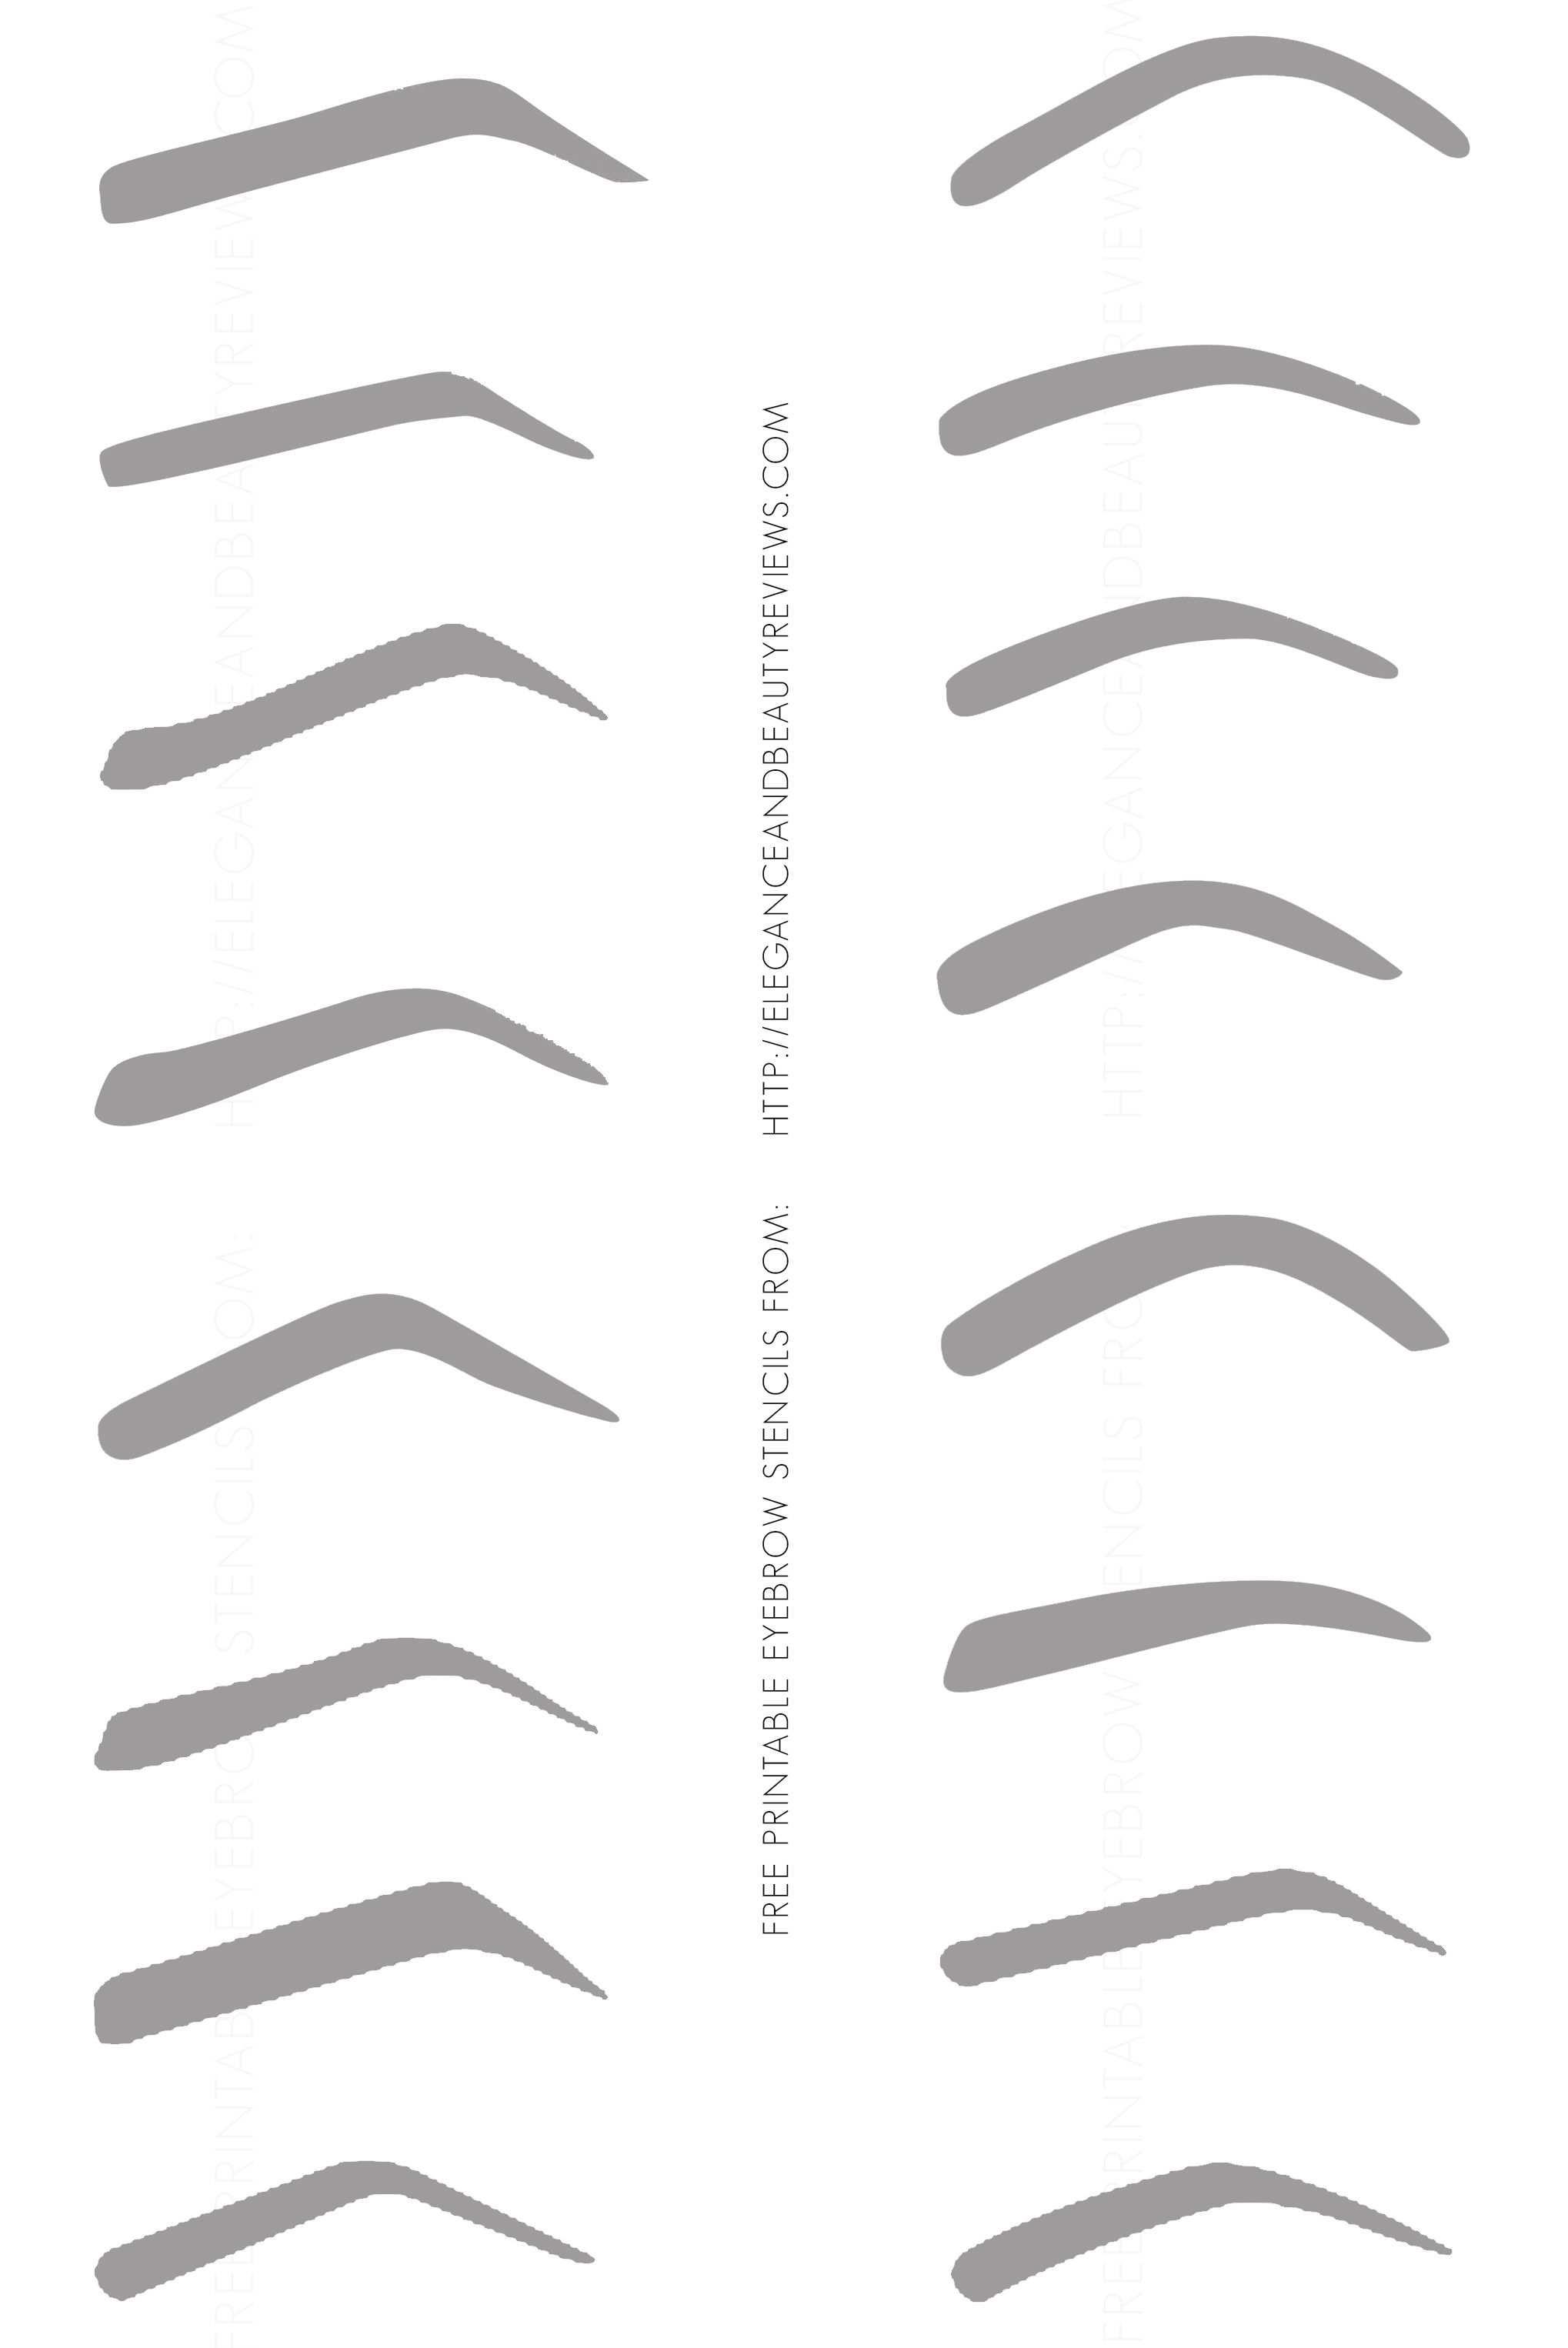 Free Printable Eyebrow Stencils Jpg 2038 3052 Eyebrow Stencil Brow Stencils Eyebrow Embroidery